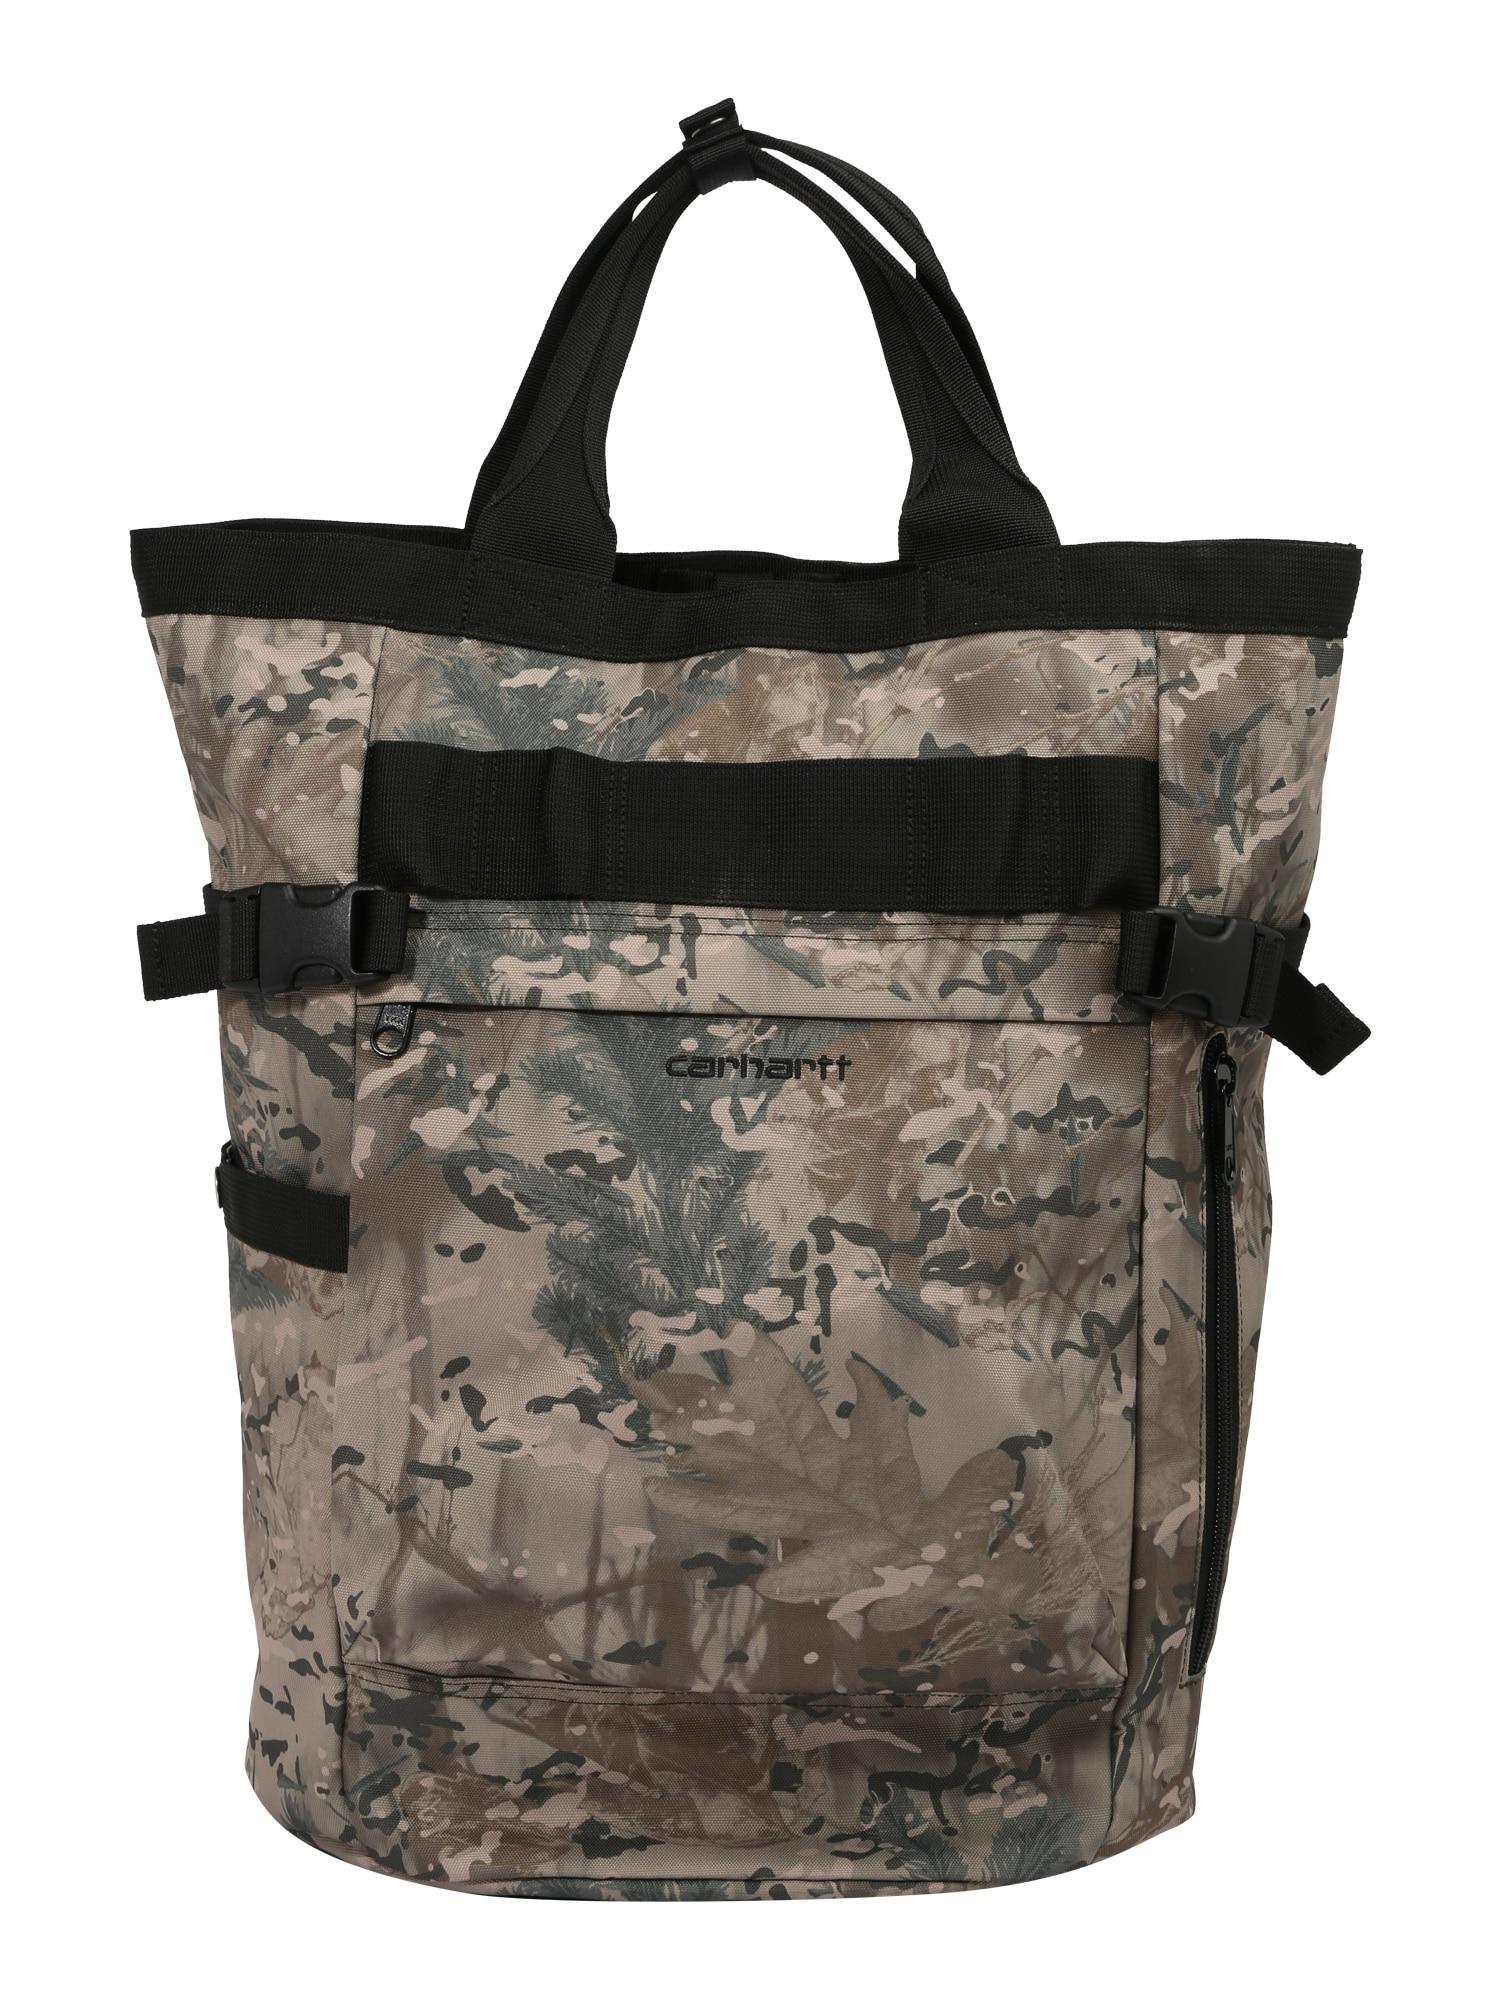 Carhartt WIP Rucksack braun / schwarz / grau